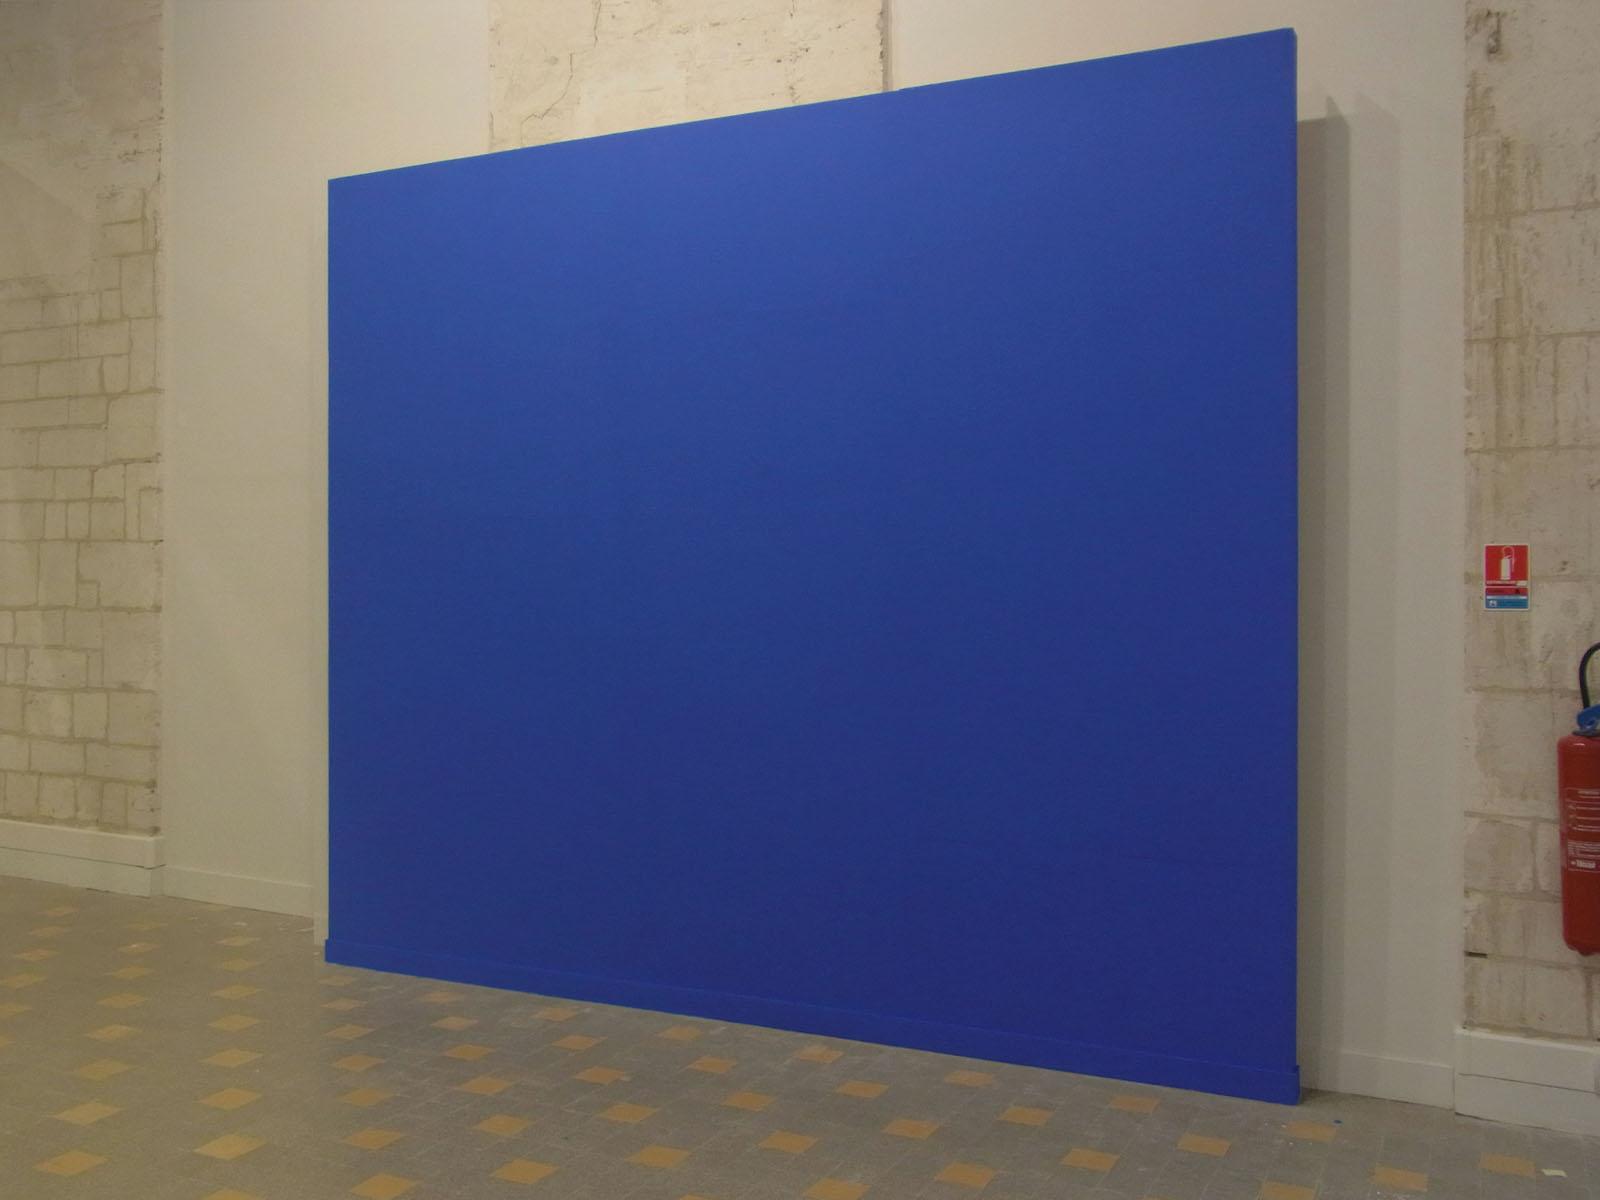 Peinture bleu marine leroy merlin for Peinture bleu marine mat